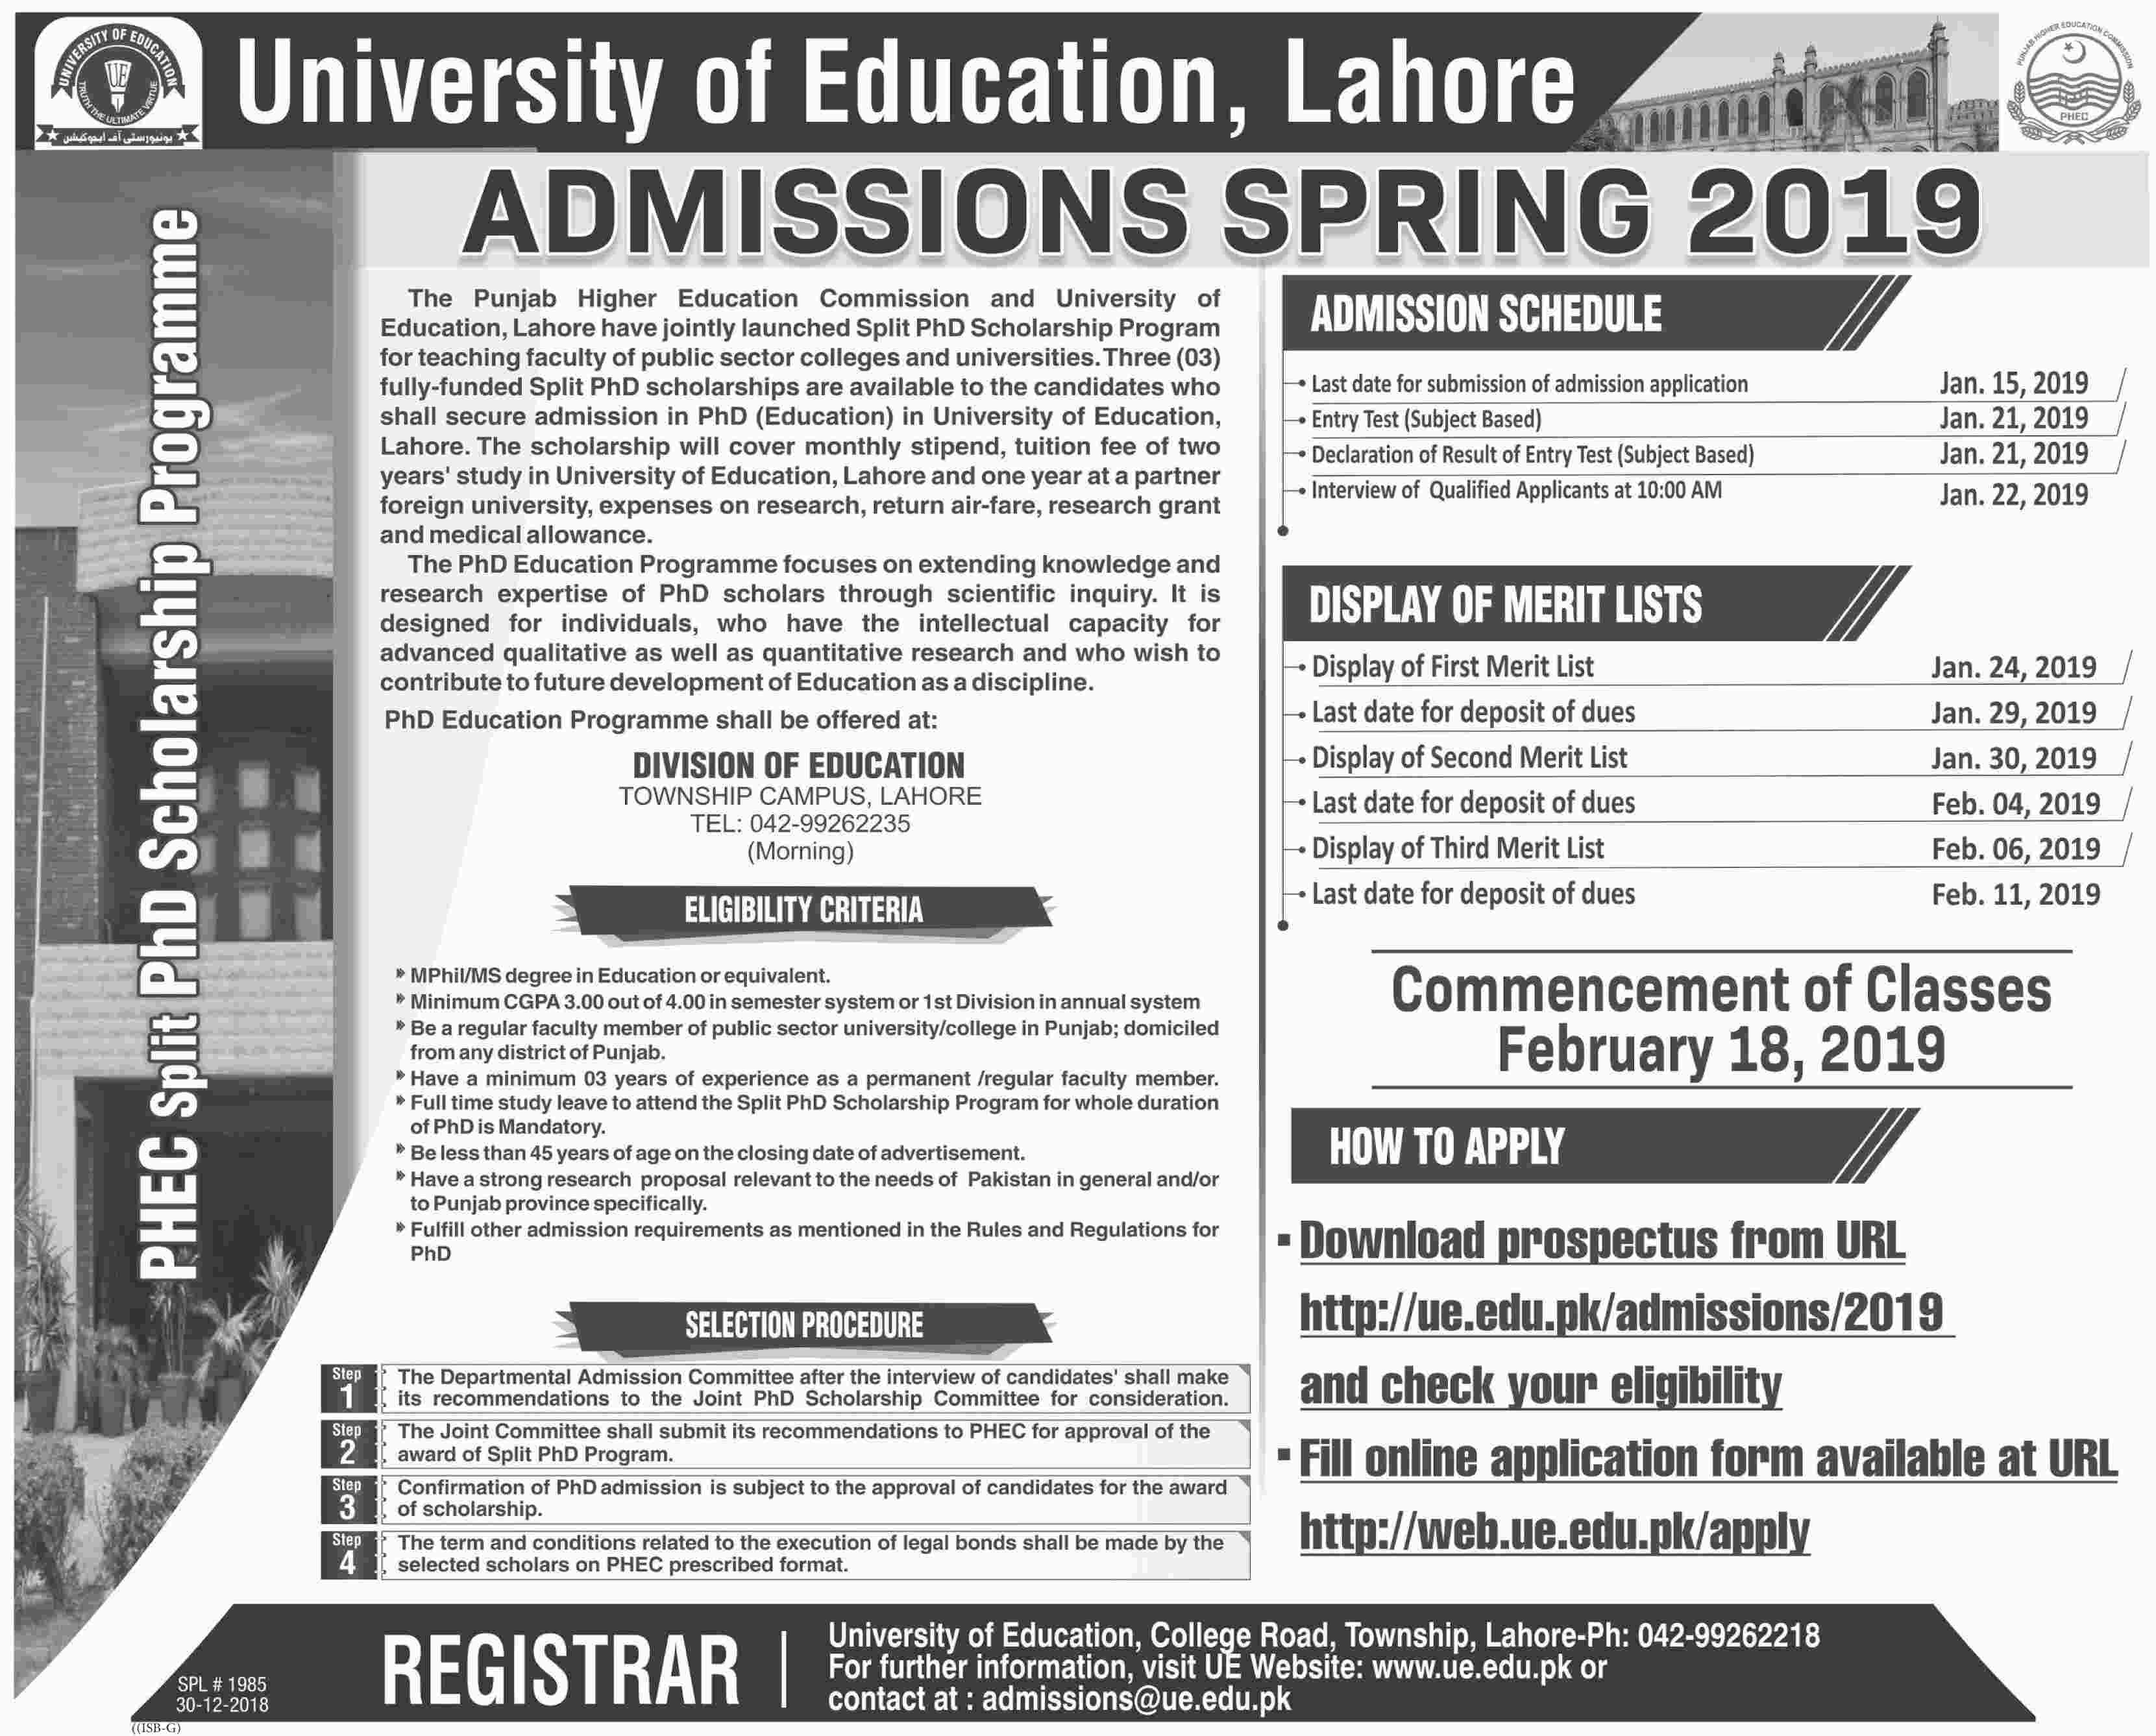 PHEC Split PhD Scholarship Pogramme - University of Education, Lahore